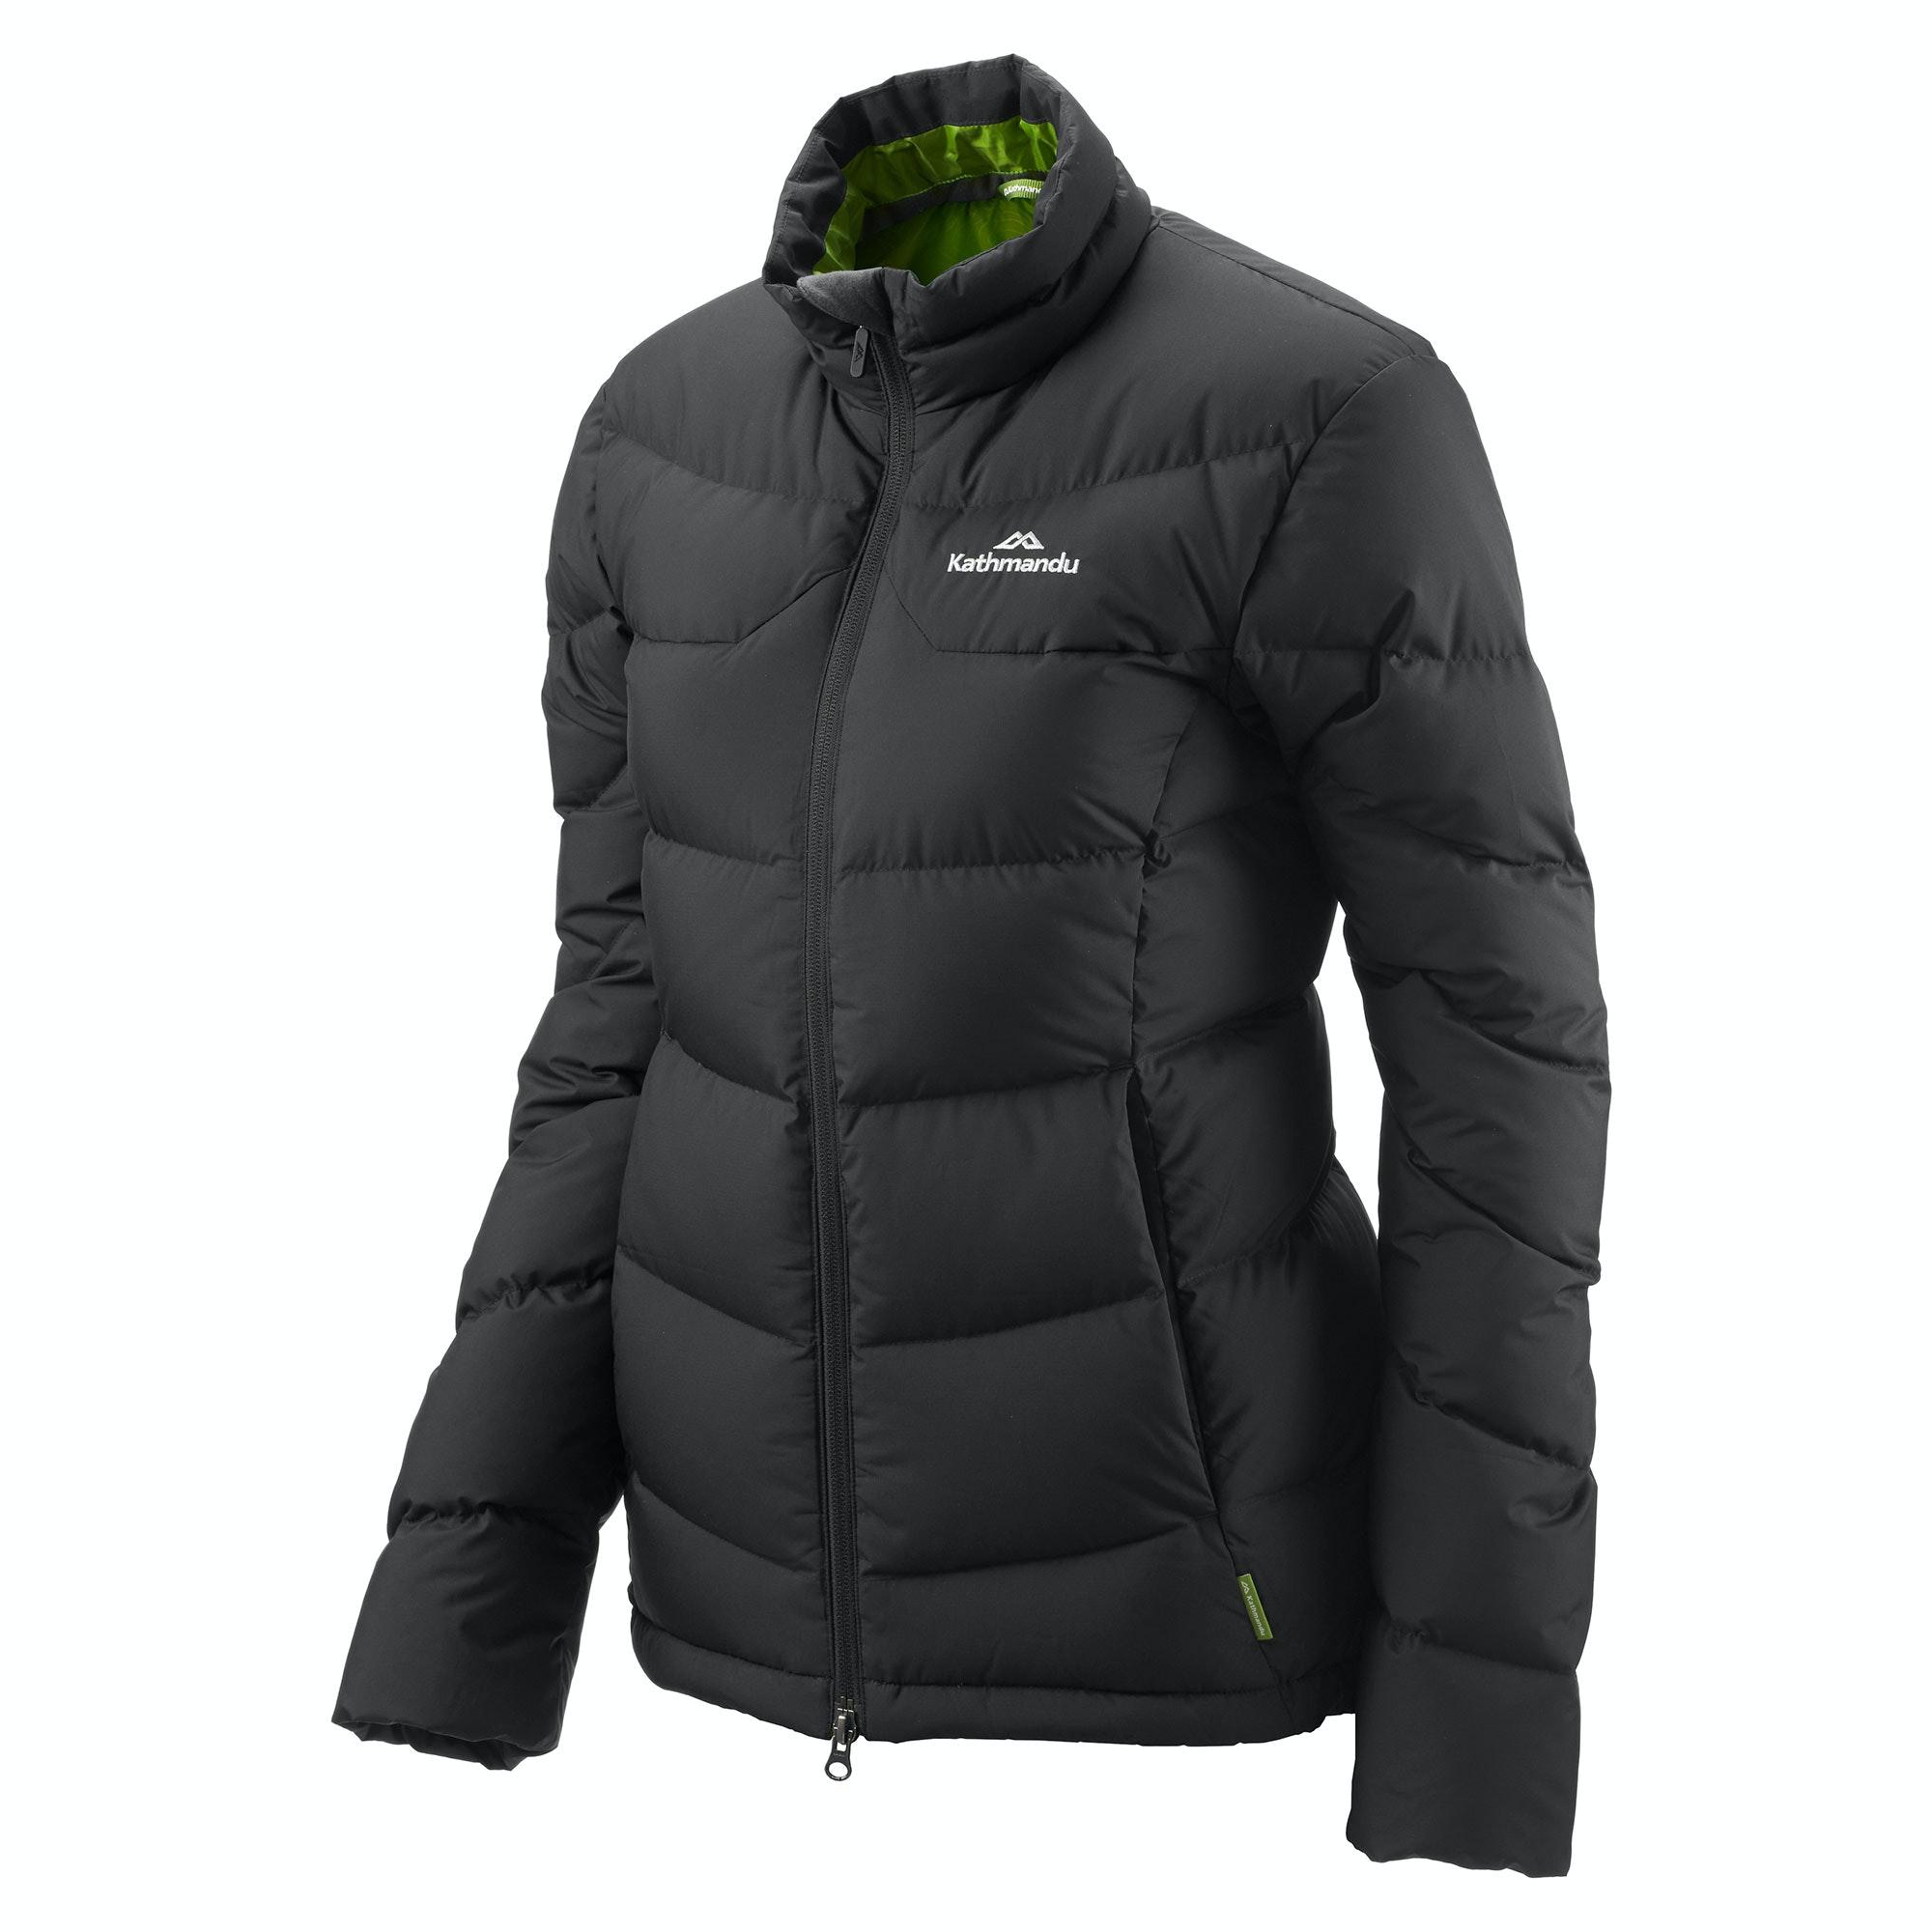 505442267f0 Kathmandu Epiq Women's Warm Winter Duck Down Puffer Jacket v2 for ...